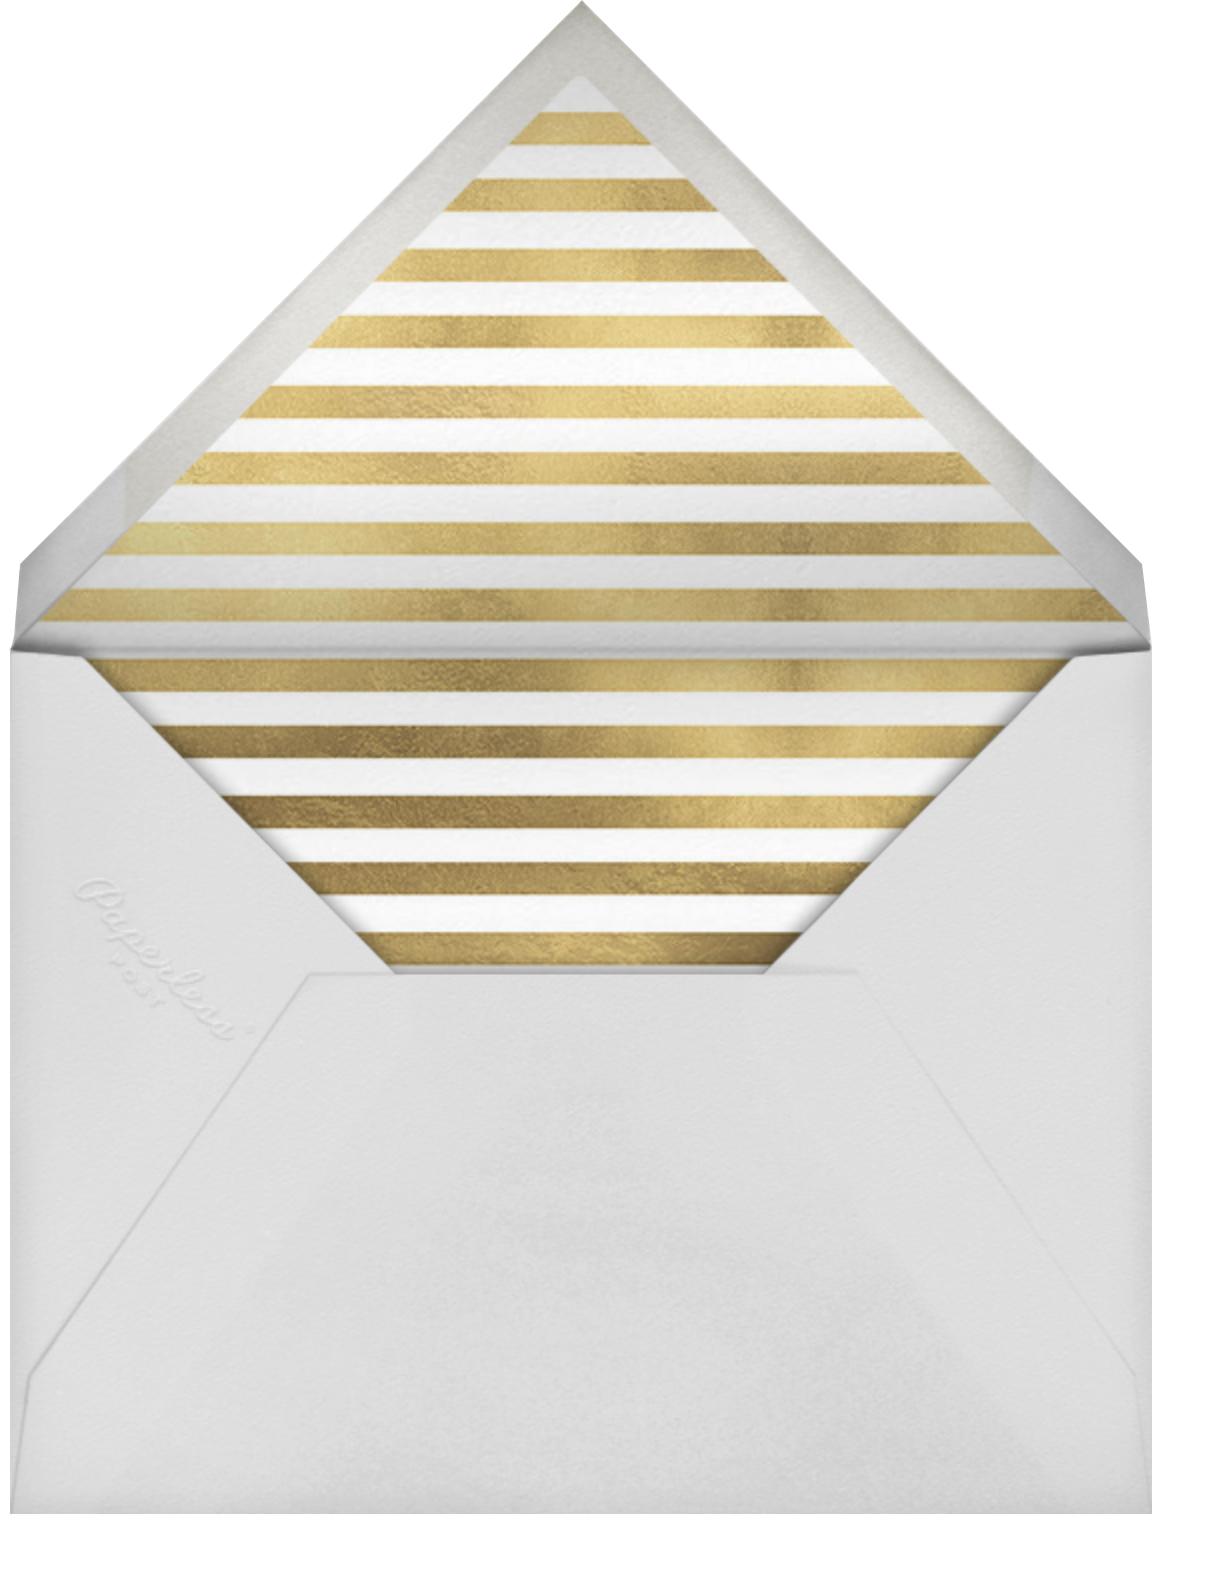 Saint-Preux (Photo) - Black/Gold - Paperless Post - Party save the dates - envelope back